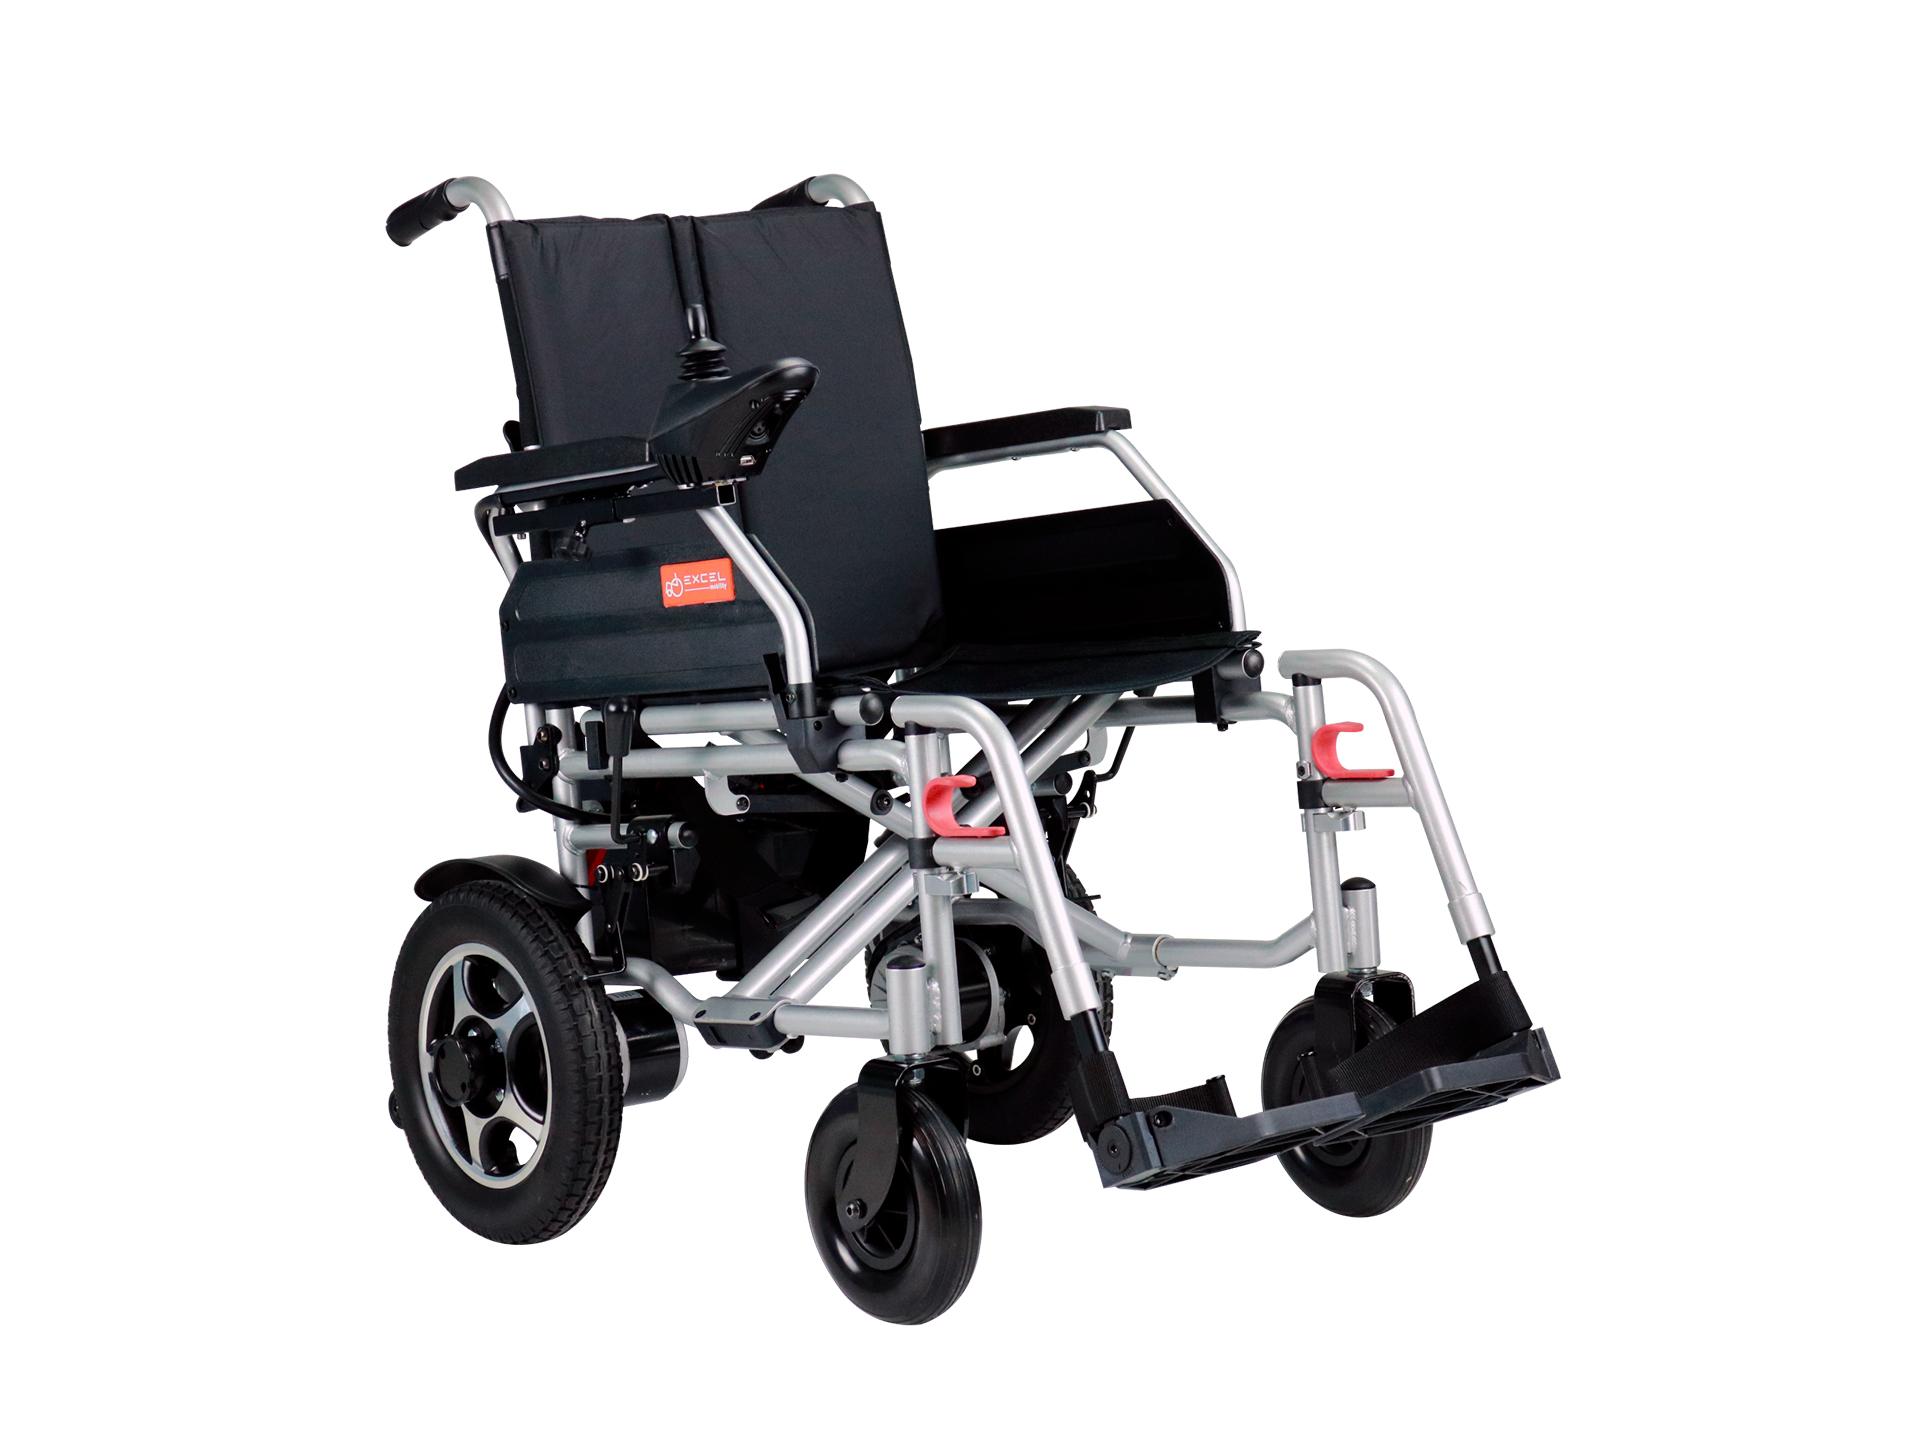 Život na invalidním vozíku